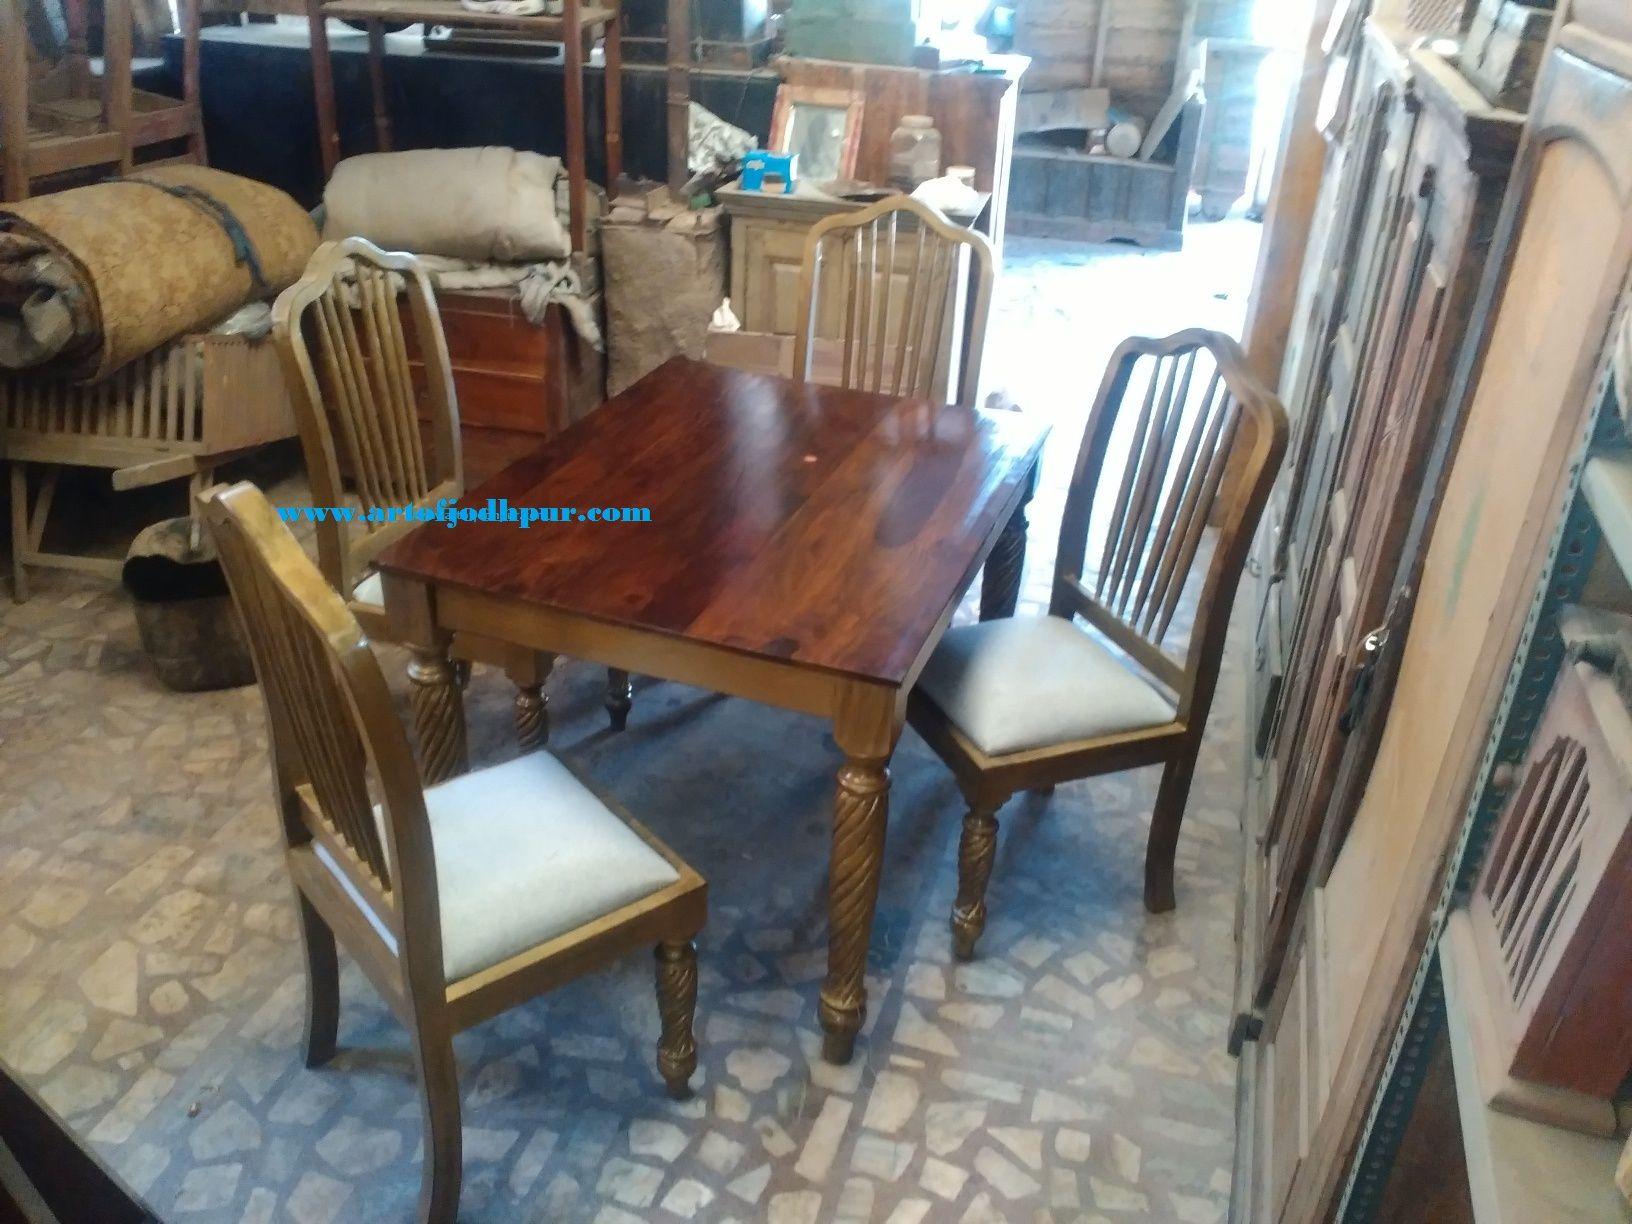 sheesham wood home furniture dining set table 40 x 34 x 30 inch chair & sheesham wood home furniture dining set table: 40 x 34 x 30 inch ...